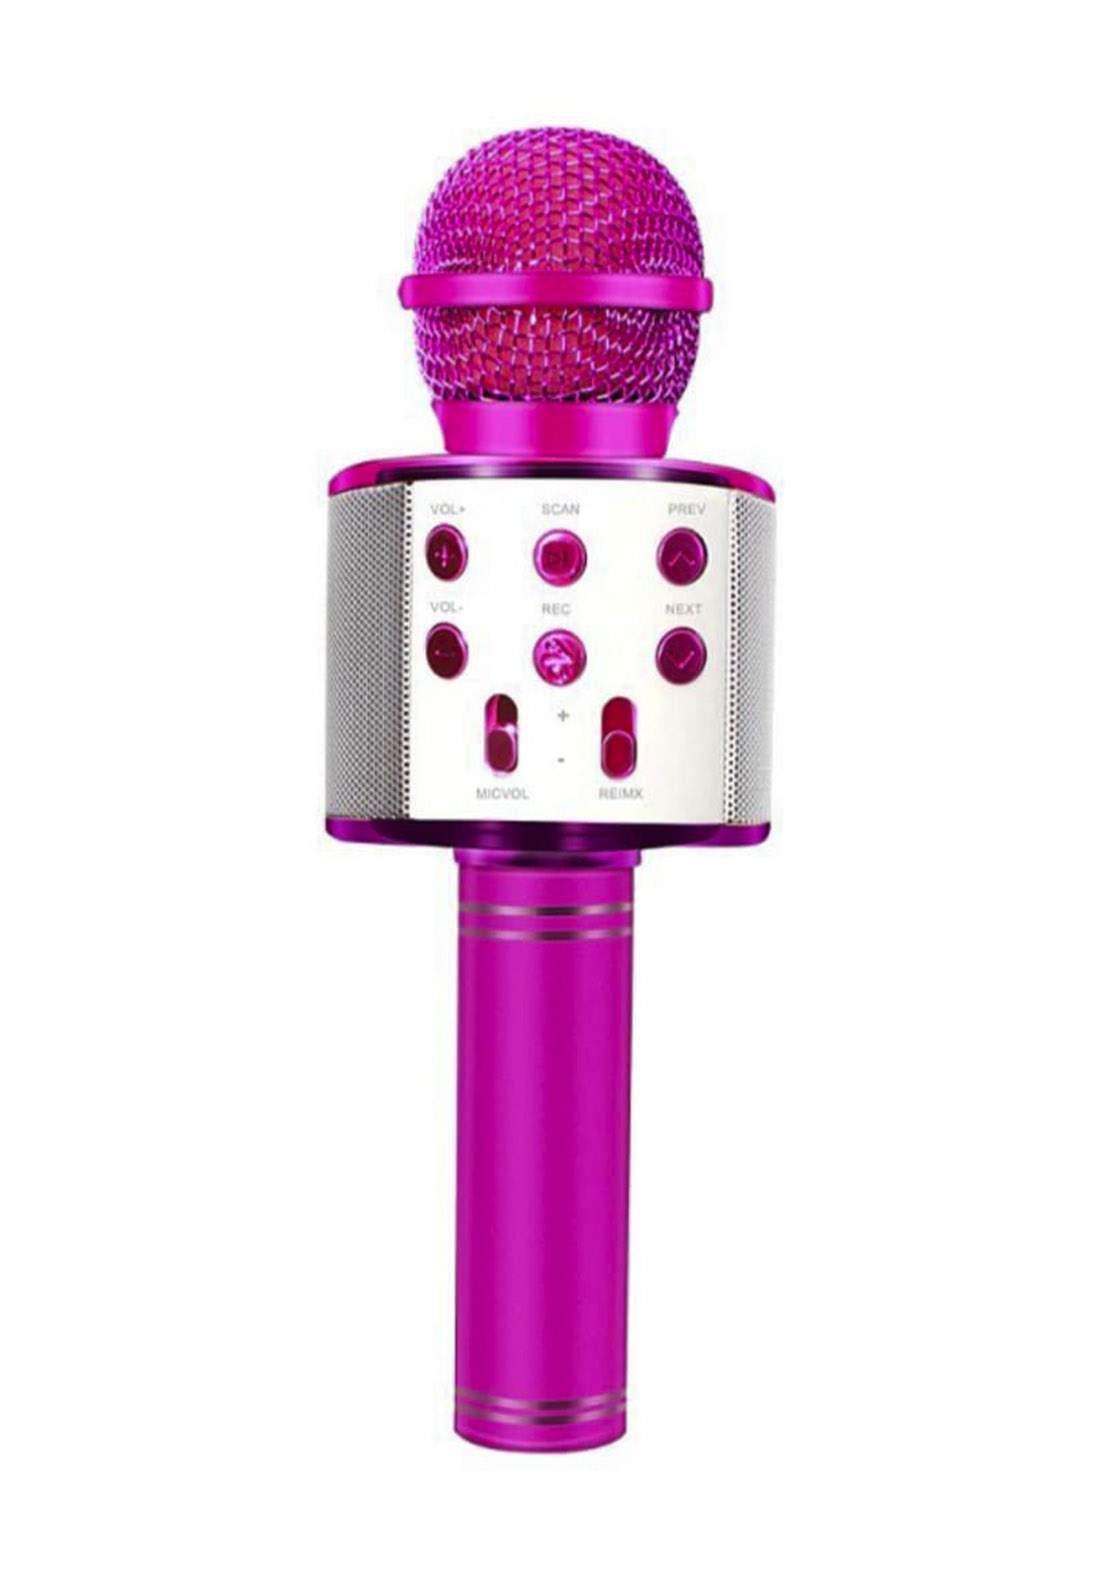 Microphone Music For Kidsلعبة  لاقطة صوت